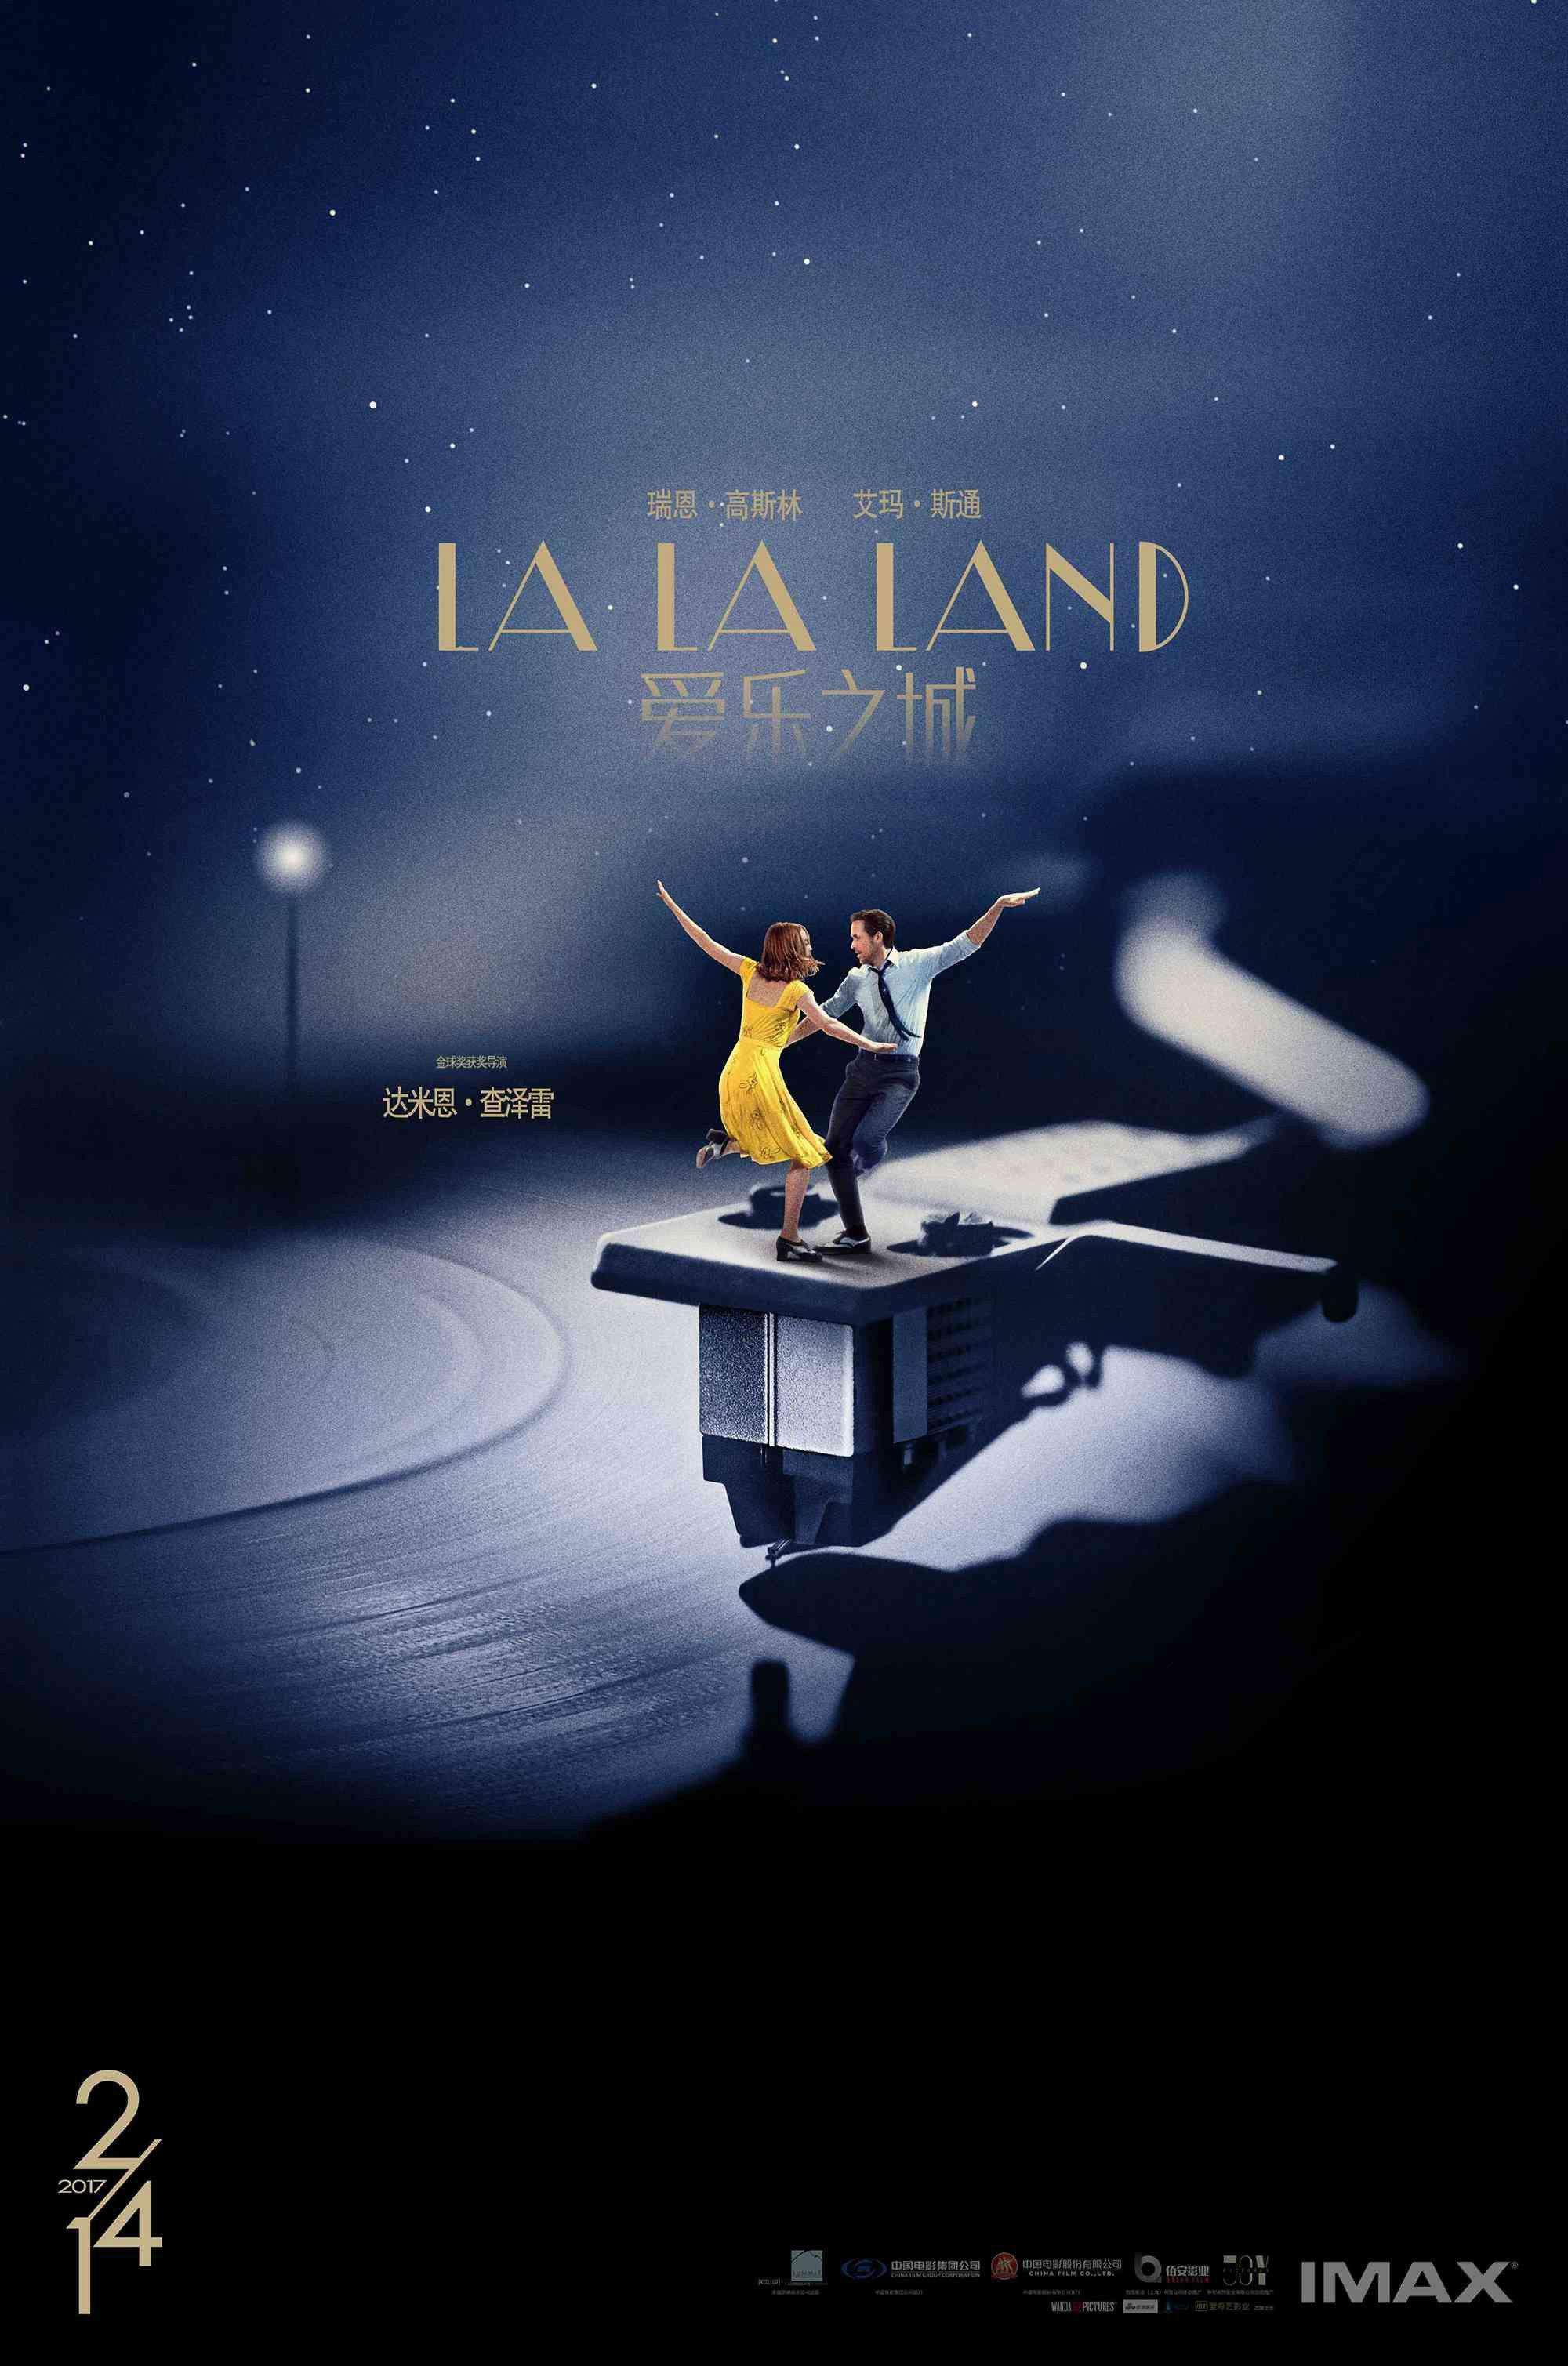 La La Land 2016 2000 X 3018 Movie Posters Film Posters Minimalist Movie Posters Minimalist